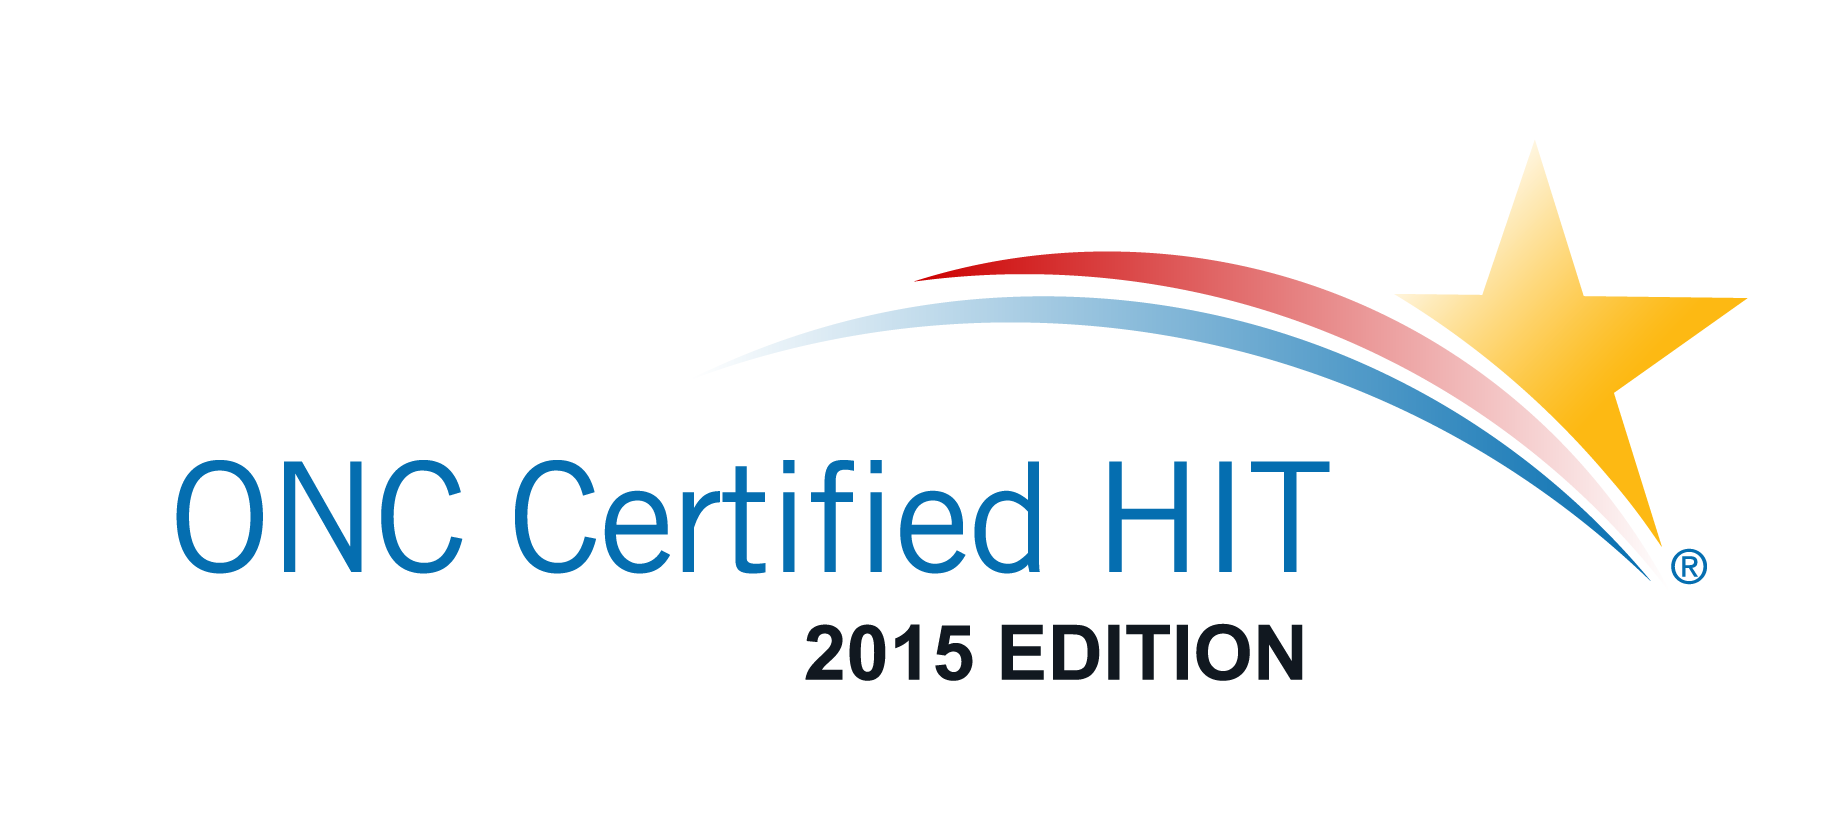 onc certification icare ehr receives edition trademark registered prlog inc hhs mozilla certified hit